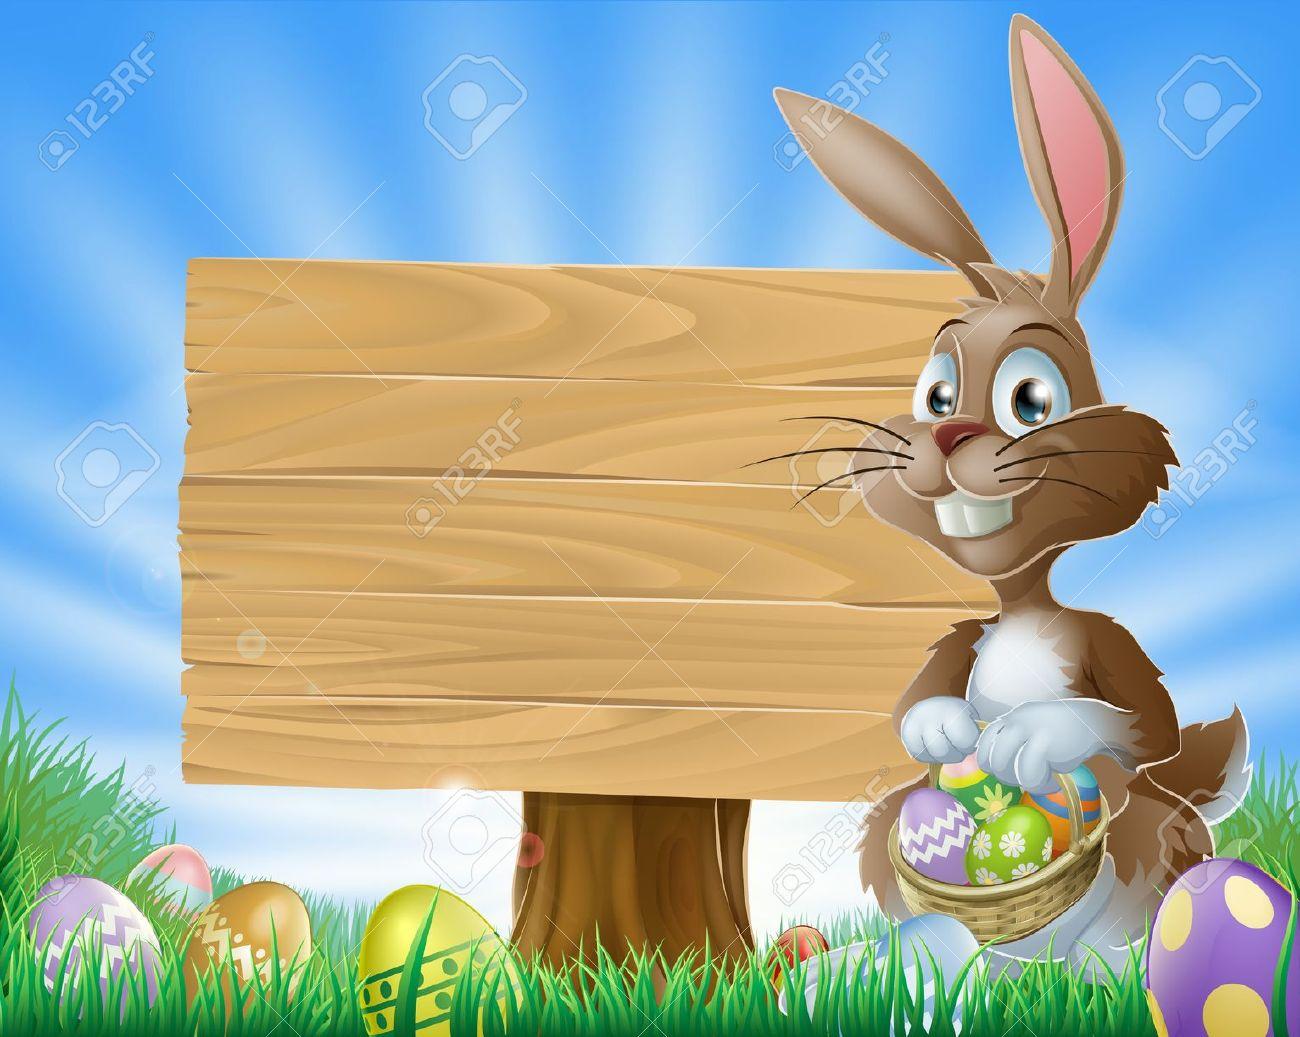 Easter egg hunt sign clipart picture royalty free download 8,233 Easter Egg Hunt Stock Vector Illustration And Royalty Free ... picture royalty free download